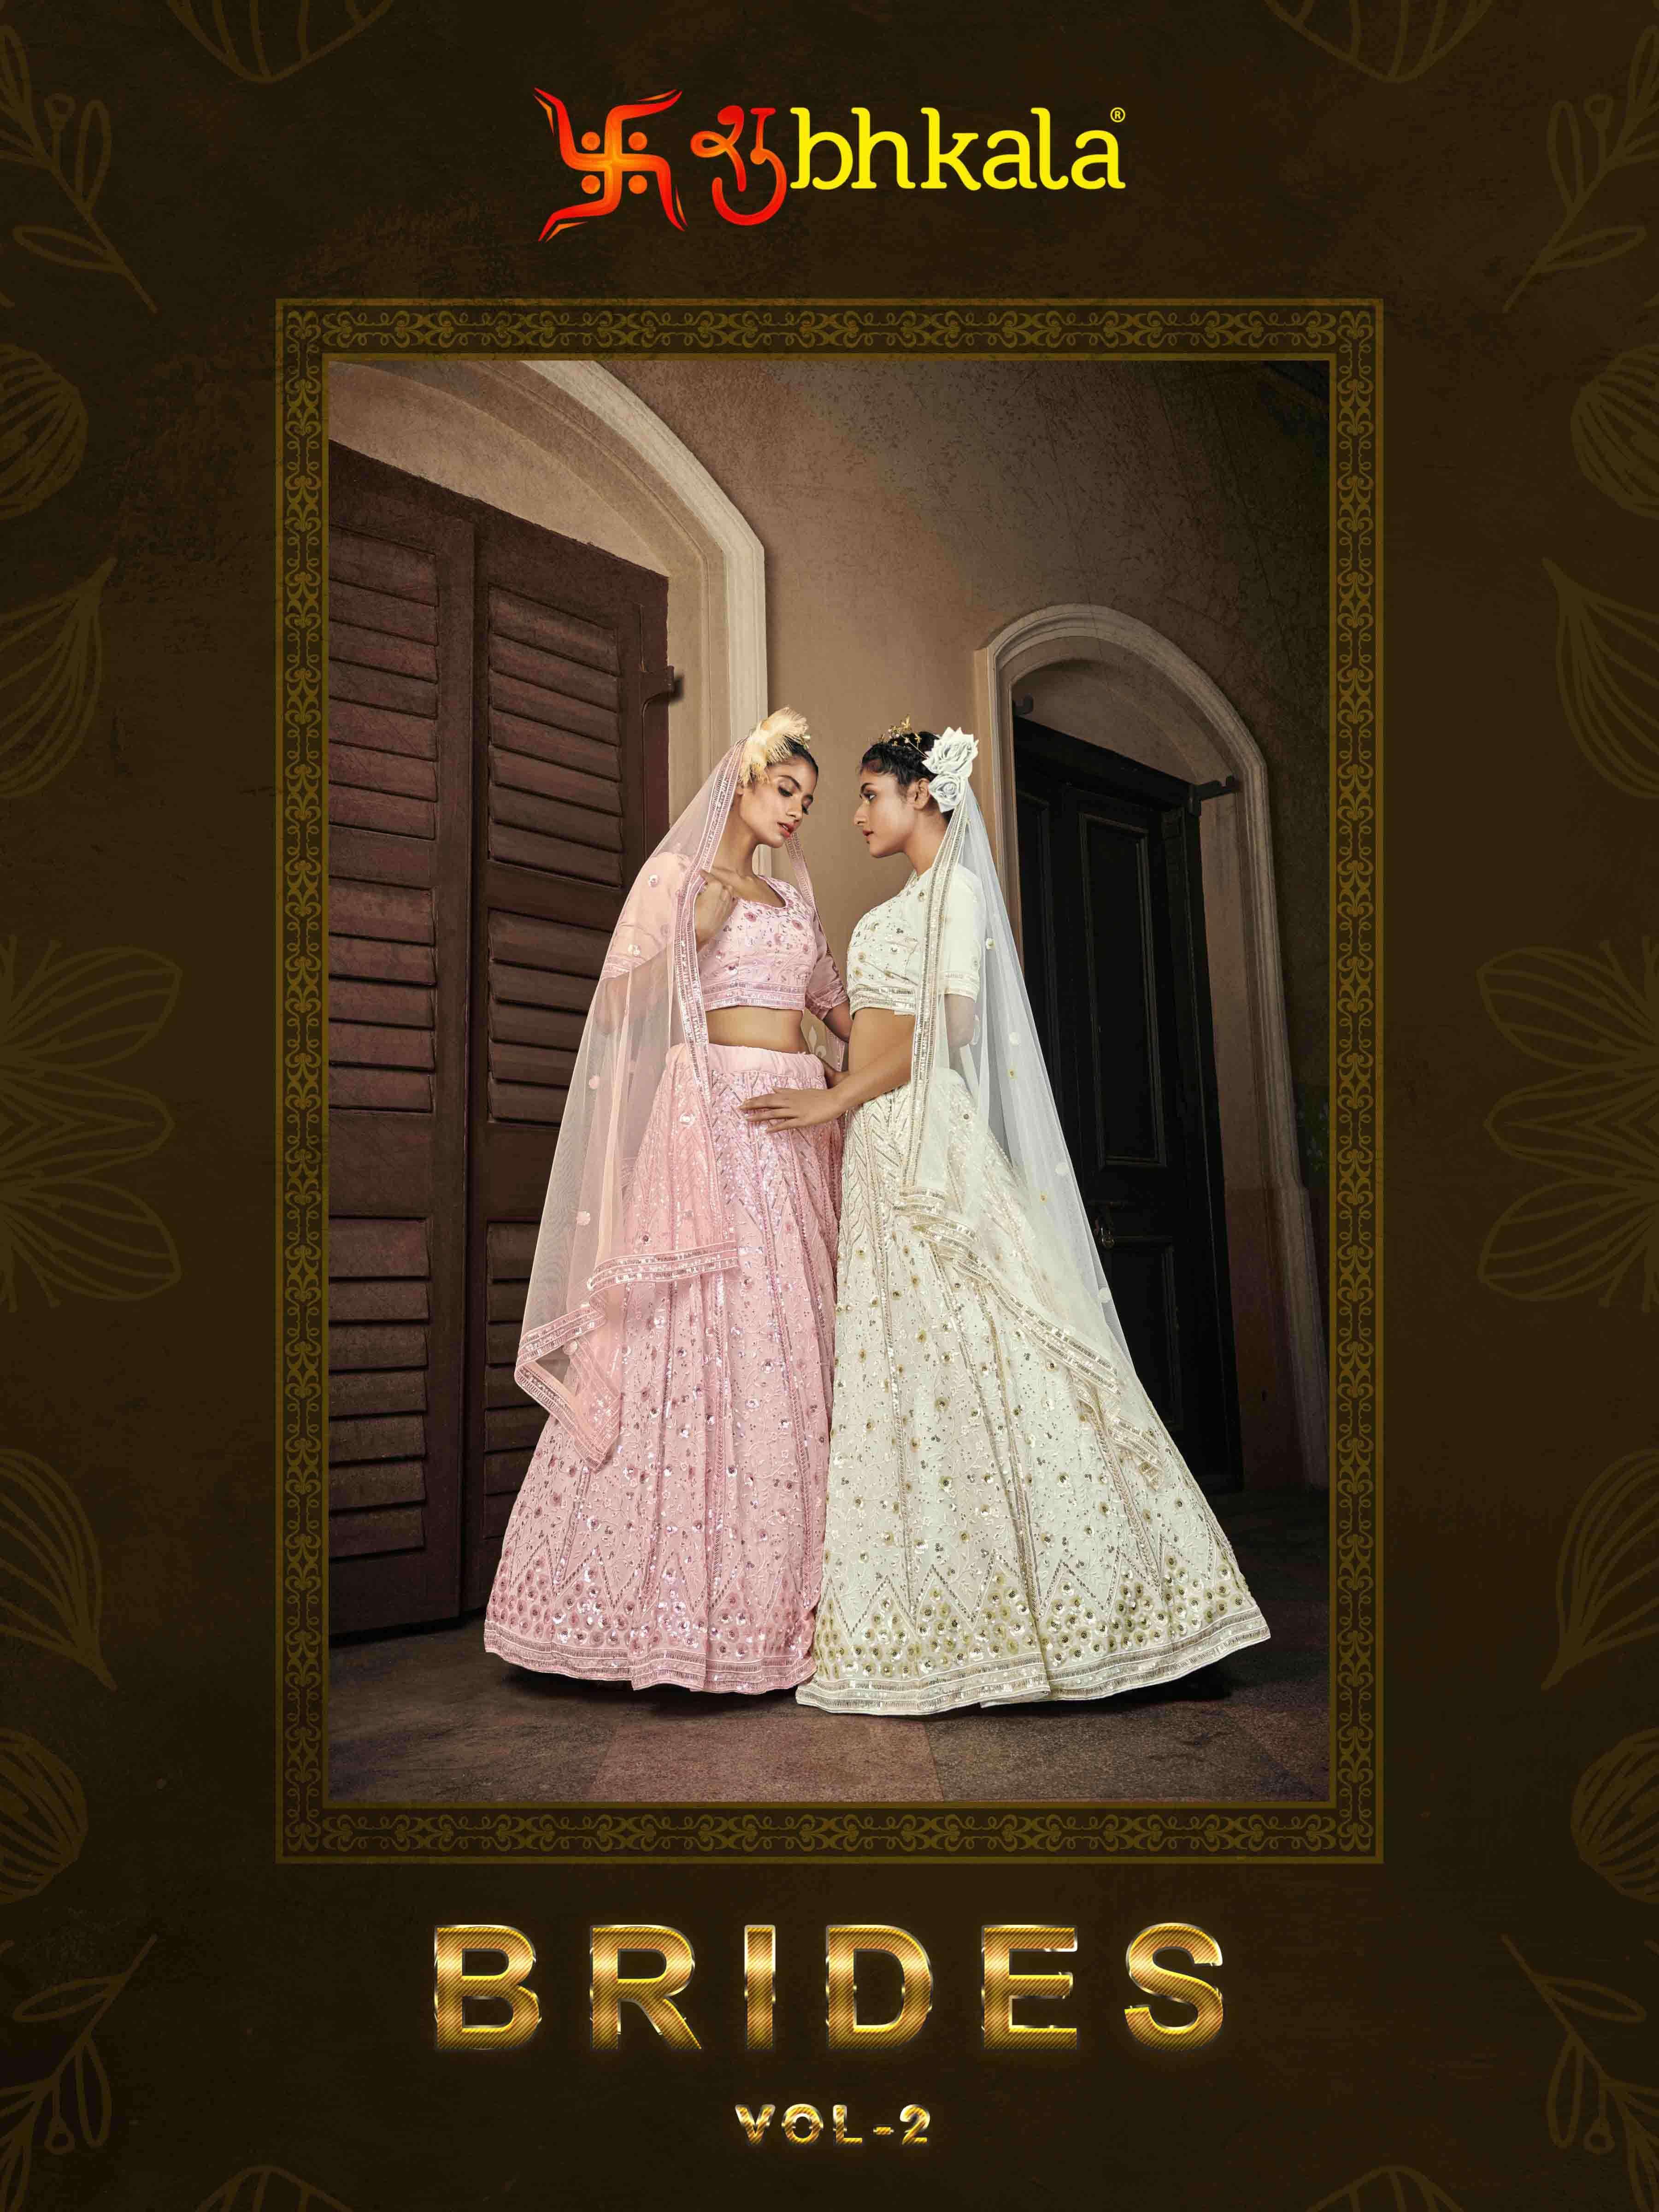 Brides Vol. 2 Shubhkala  Exclusive Bridal Lehenga Choli Collection